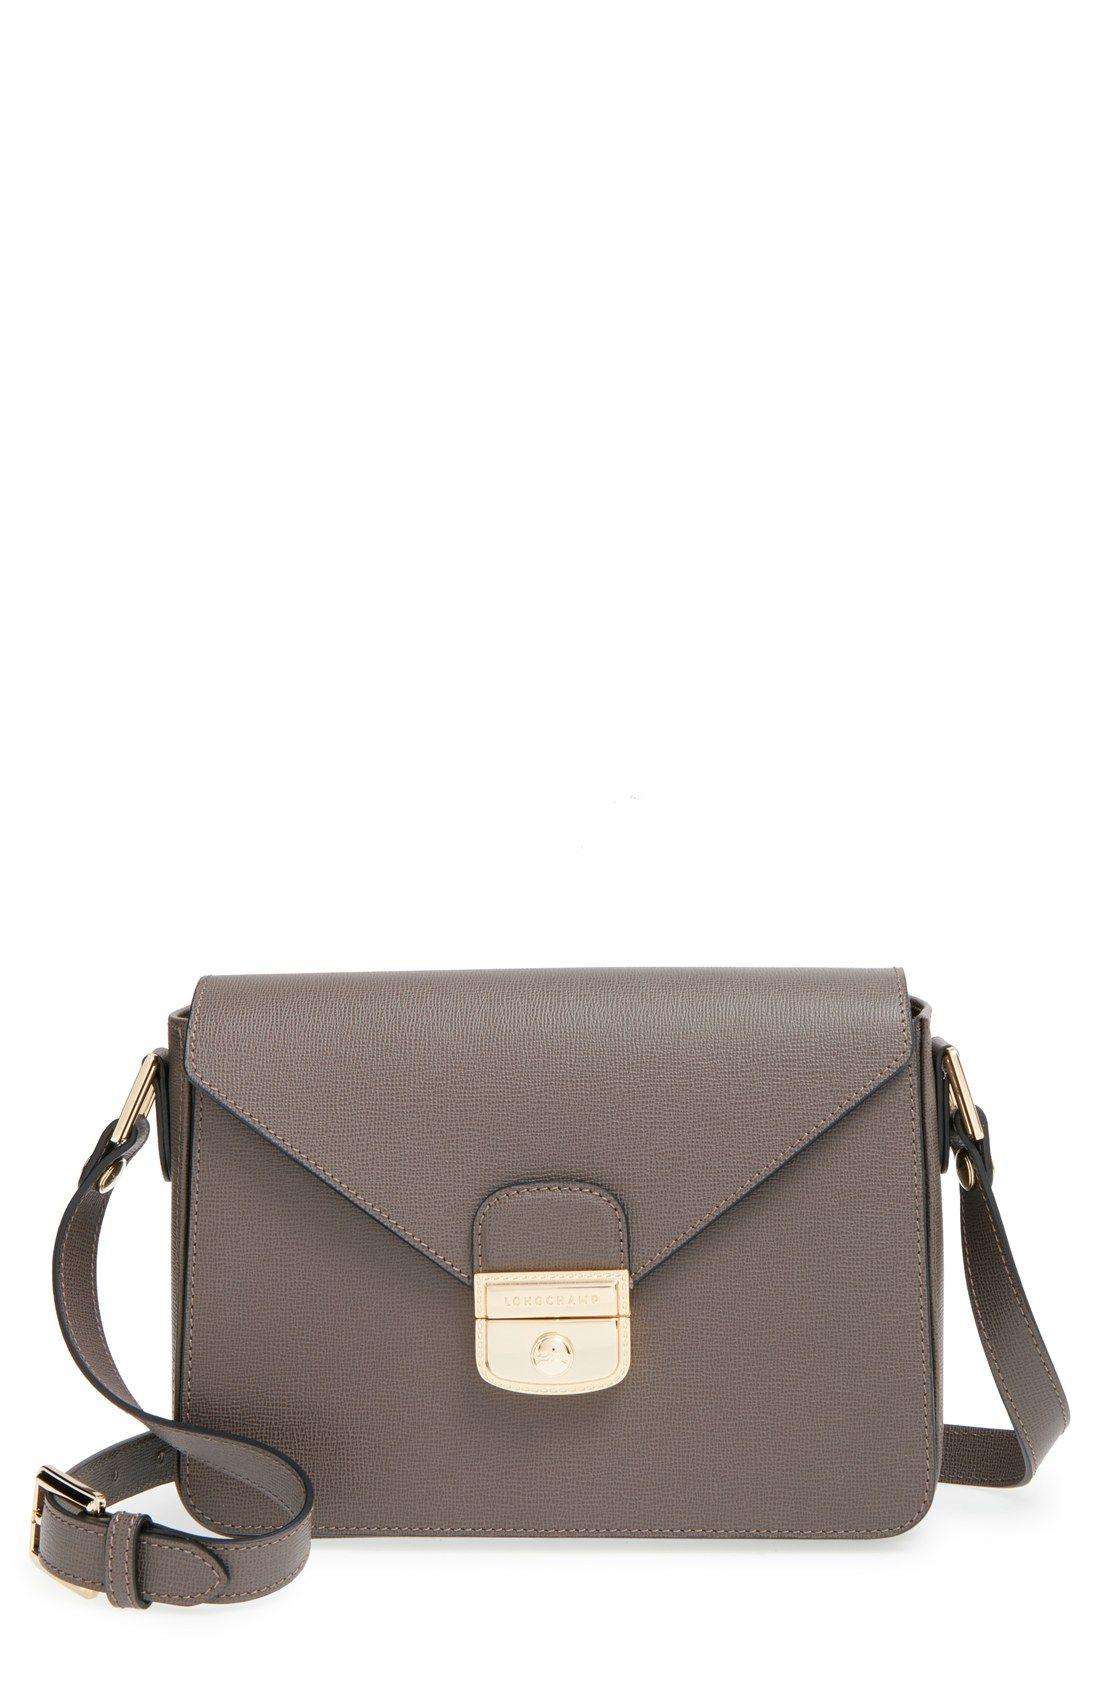 Longchamp \u0027Le Pliage- Heritage\u0027 Crossbody Bag